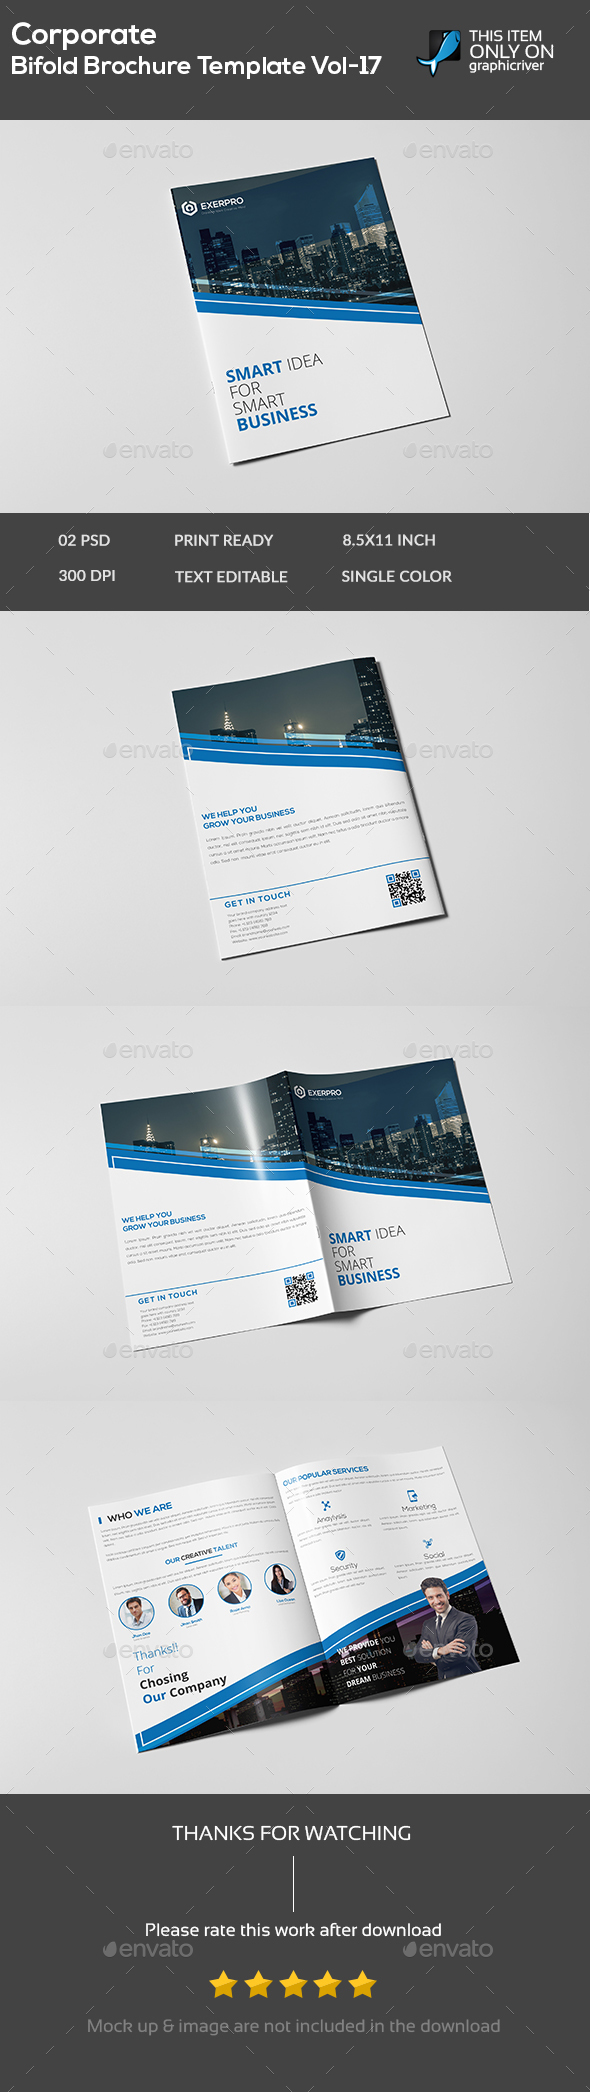 Corporate Bifold Brochure Template Vol-17 - Brochures Print Templates